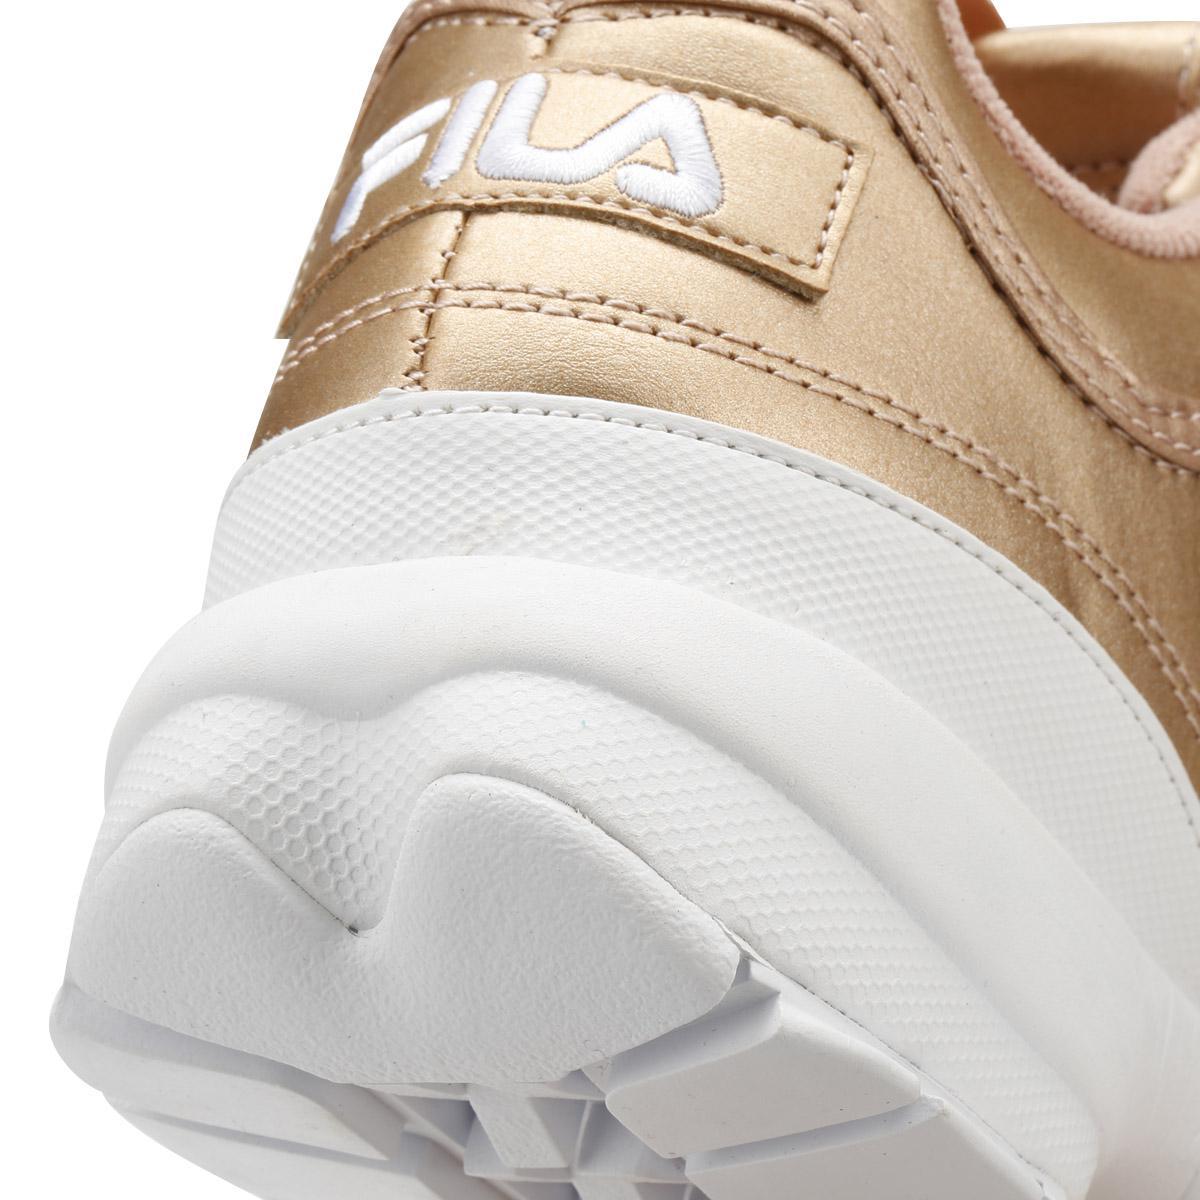 bab242633ad Lyst - Fila Disruptor Ii Womens Metallic Rose Gold Premium Trainers ...